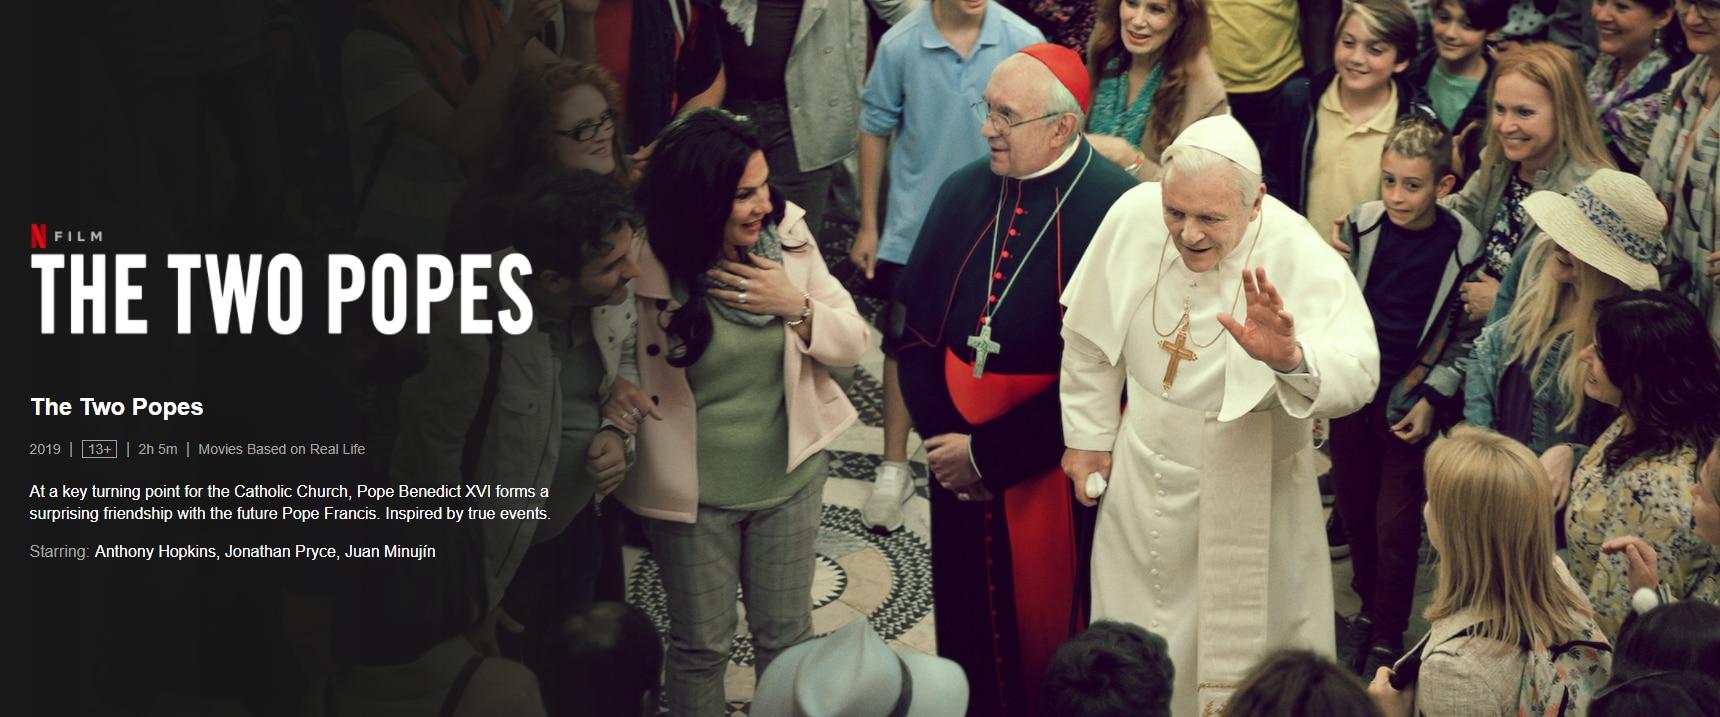 6 inspiring, spiritual content to watch this Holy Week 4